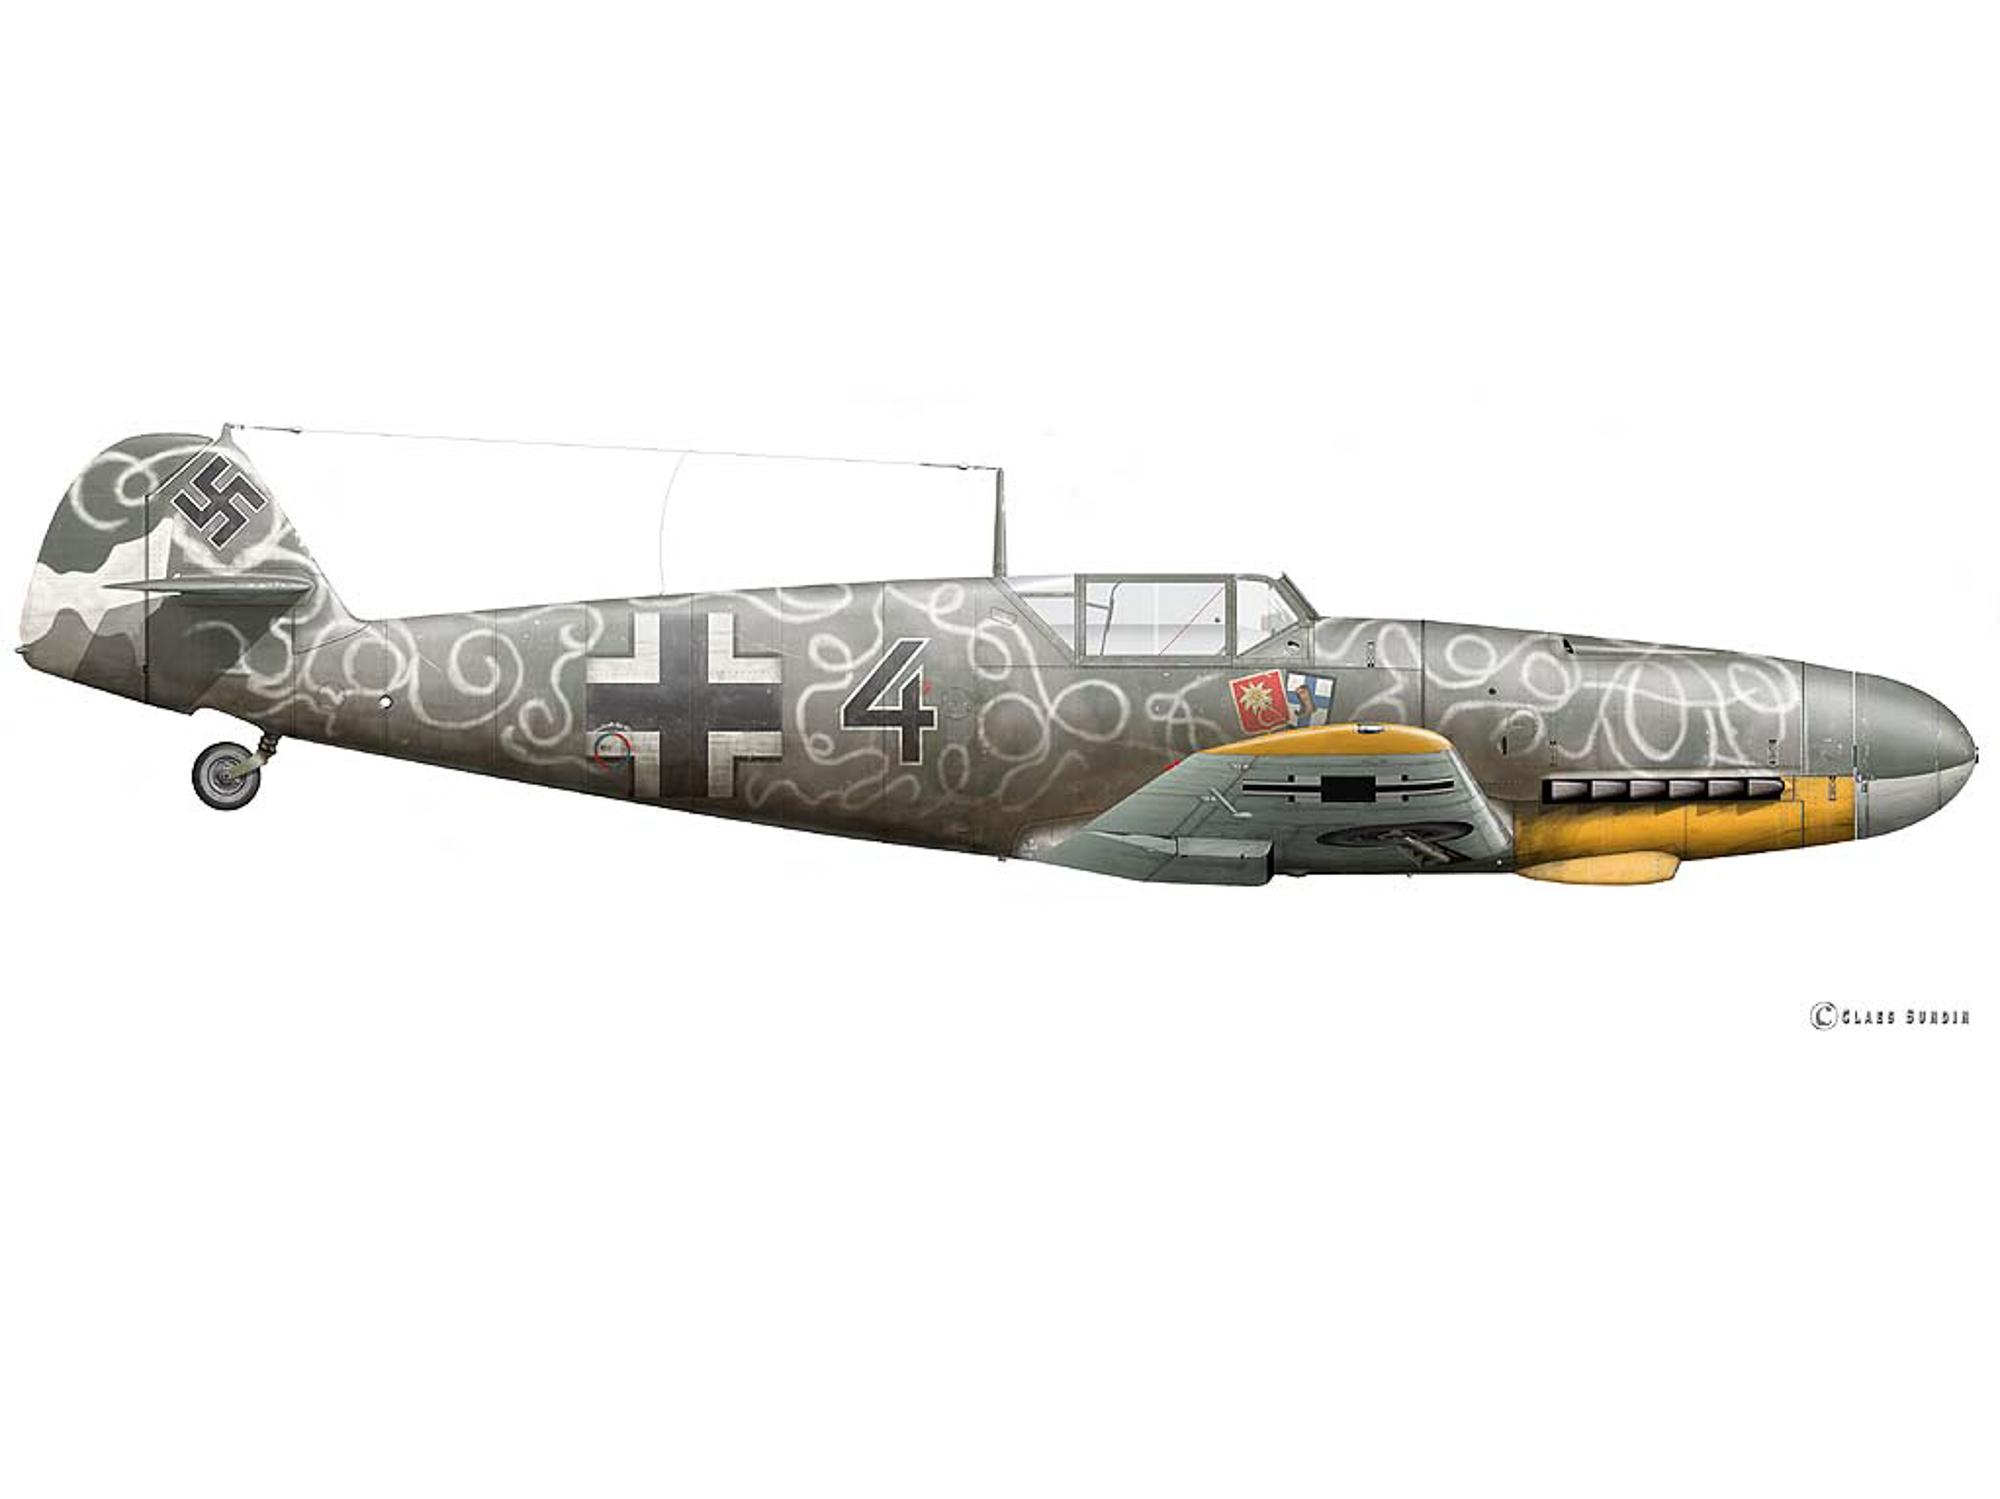 Bf 109F-4 - Black 4 - W.Nr. 13169